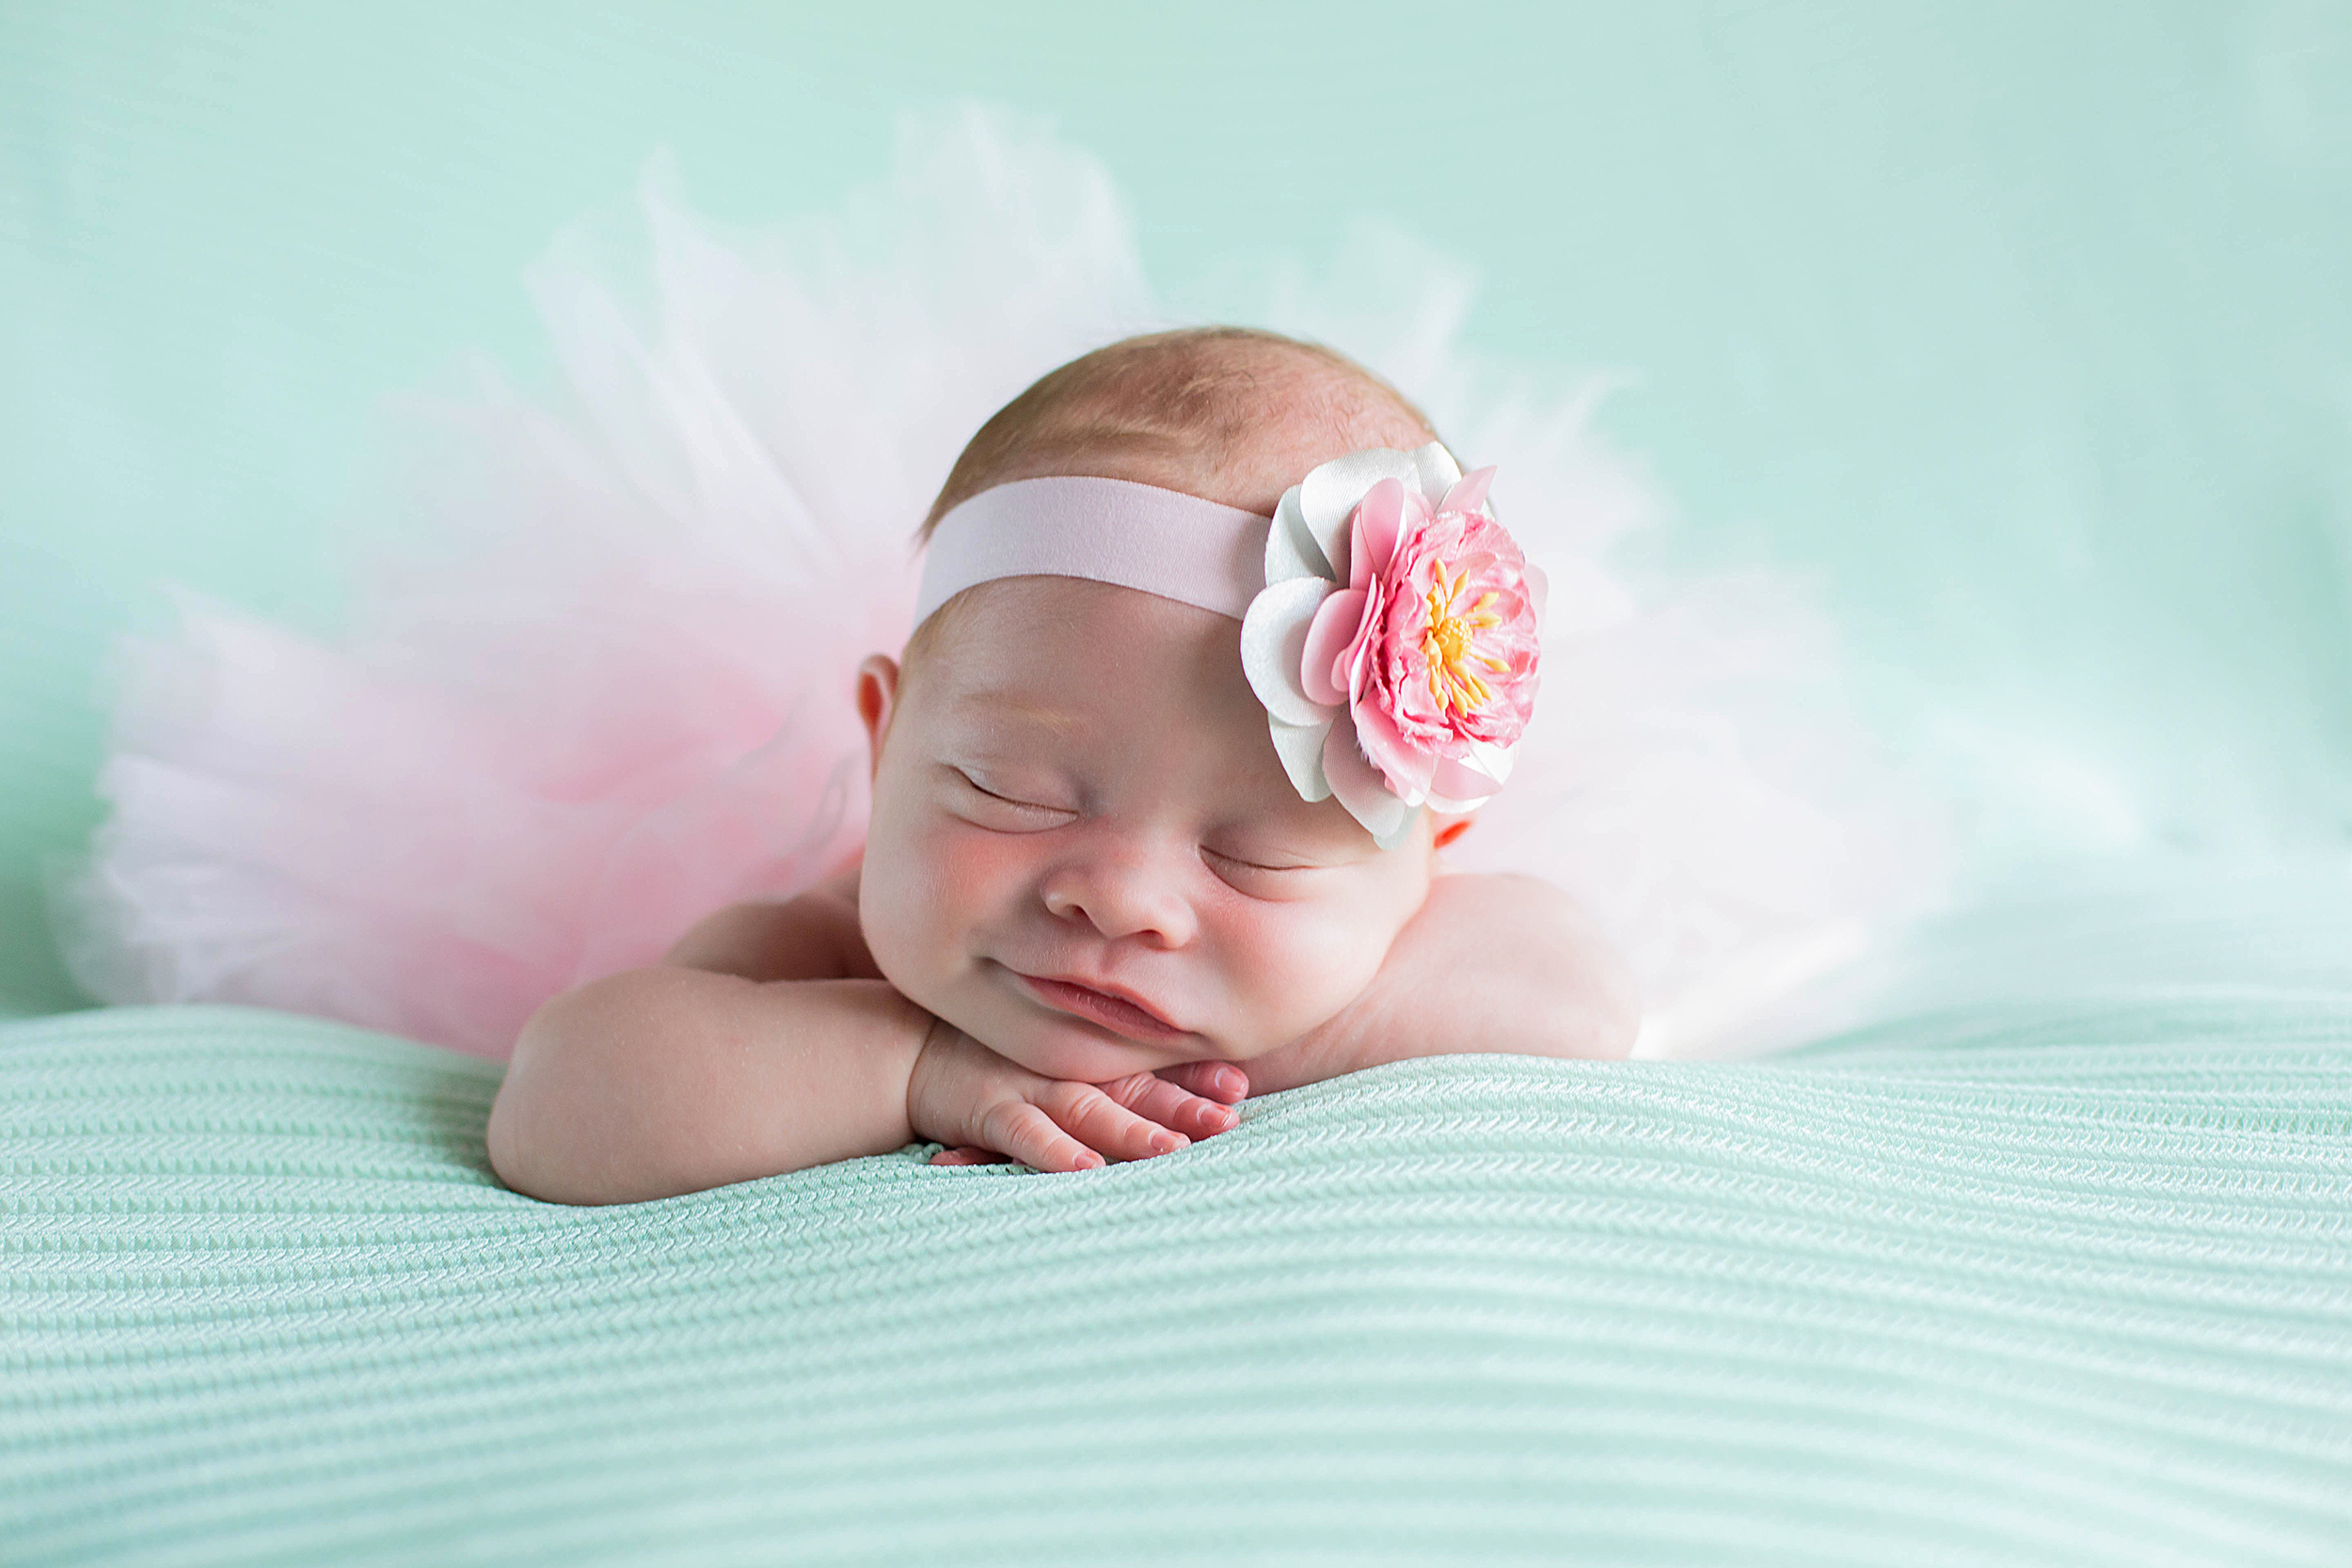 tavares-newborn-photographer.jpg